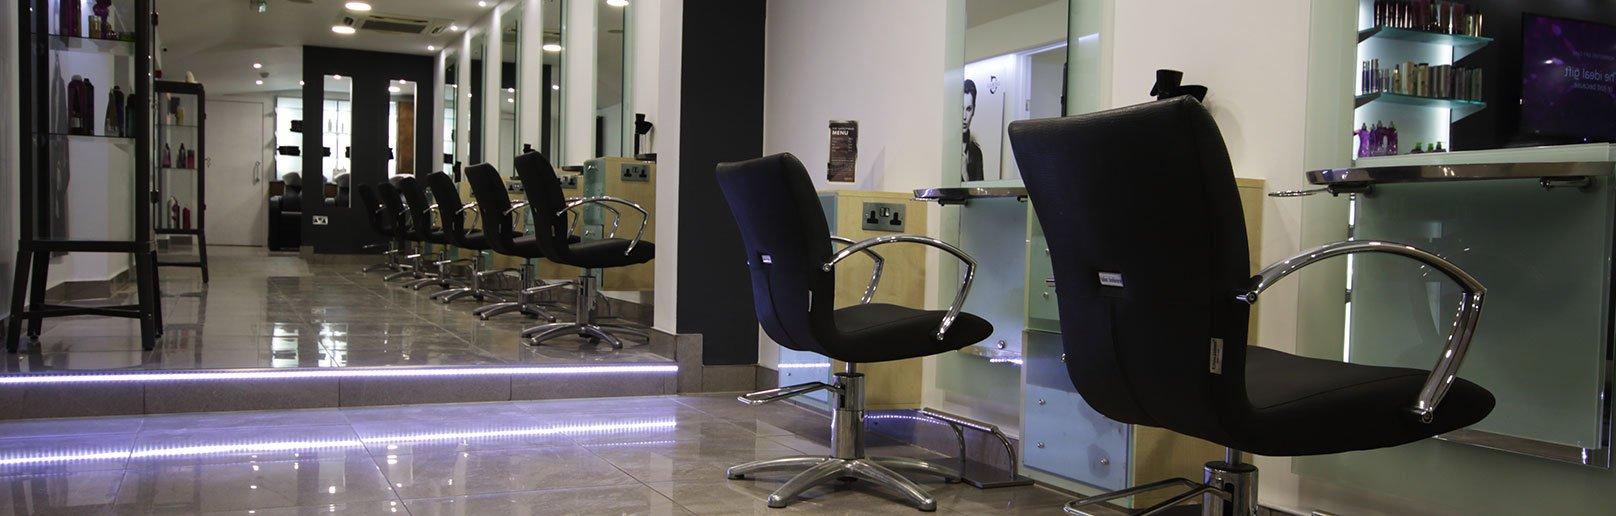 Forresters Thatcham hair salon stylish new interior